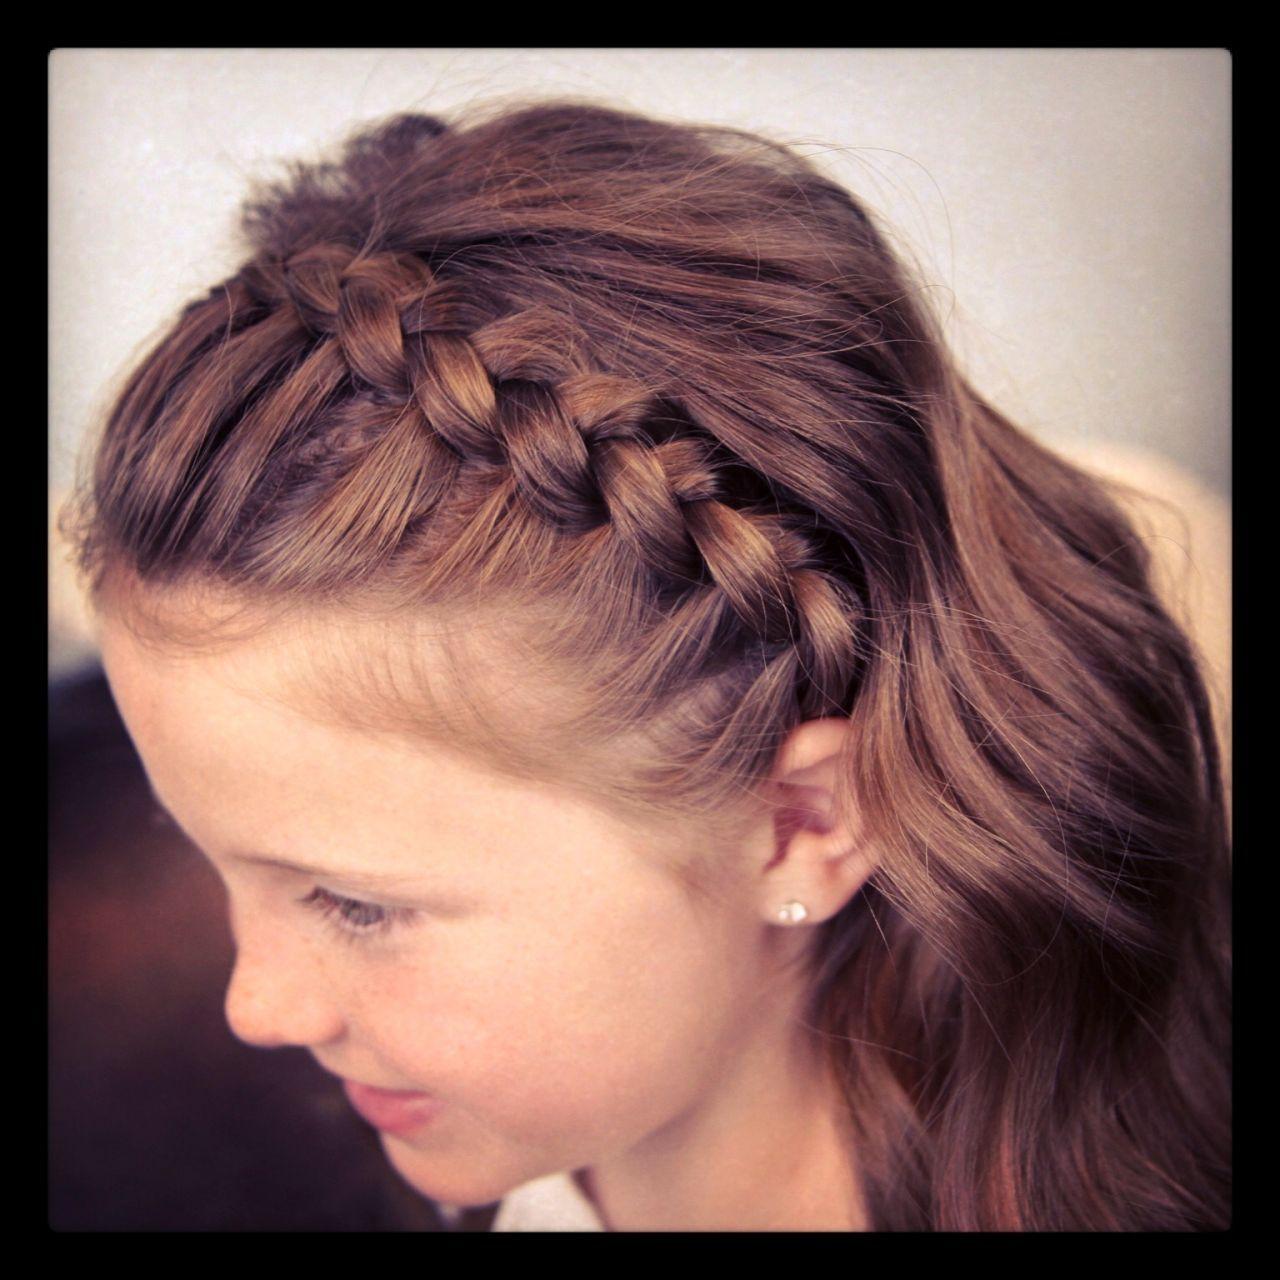 Cute easy hairstyles for school u modern long hairstyle ideas hair